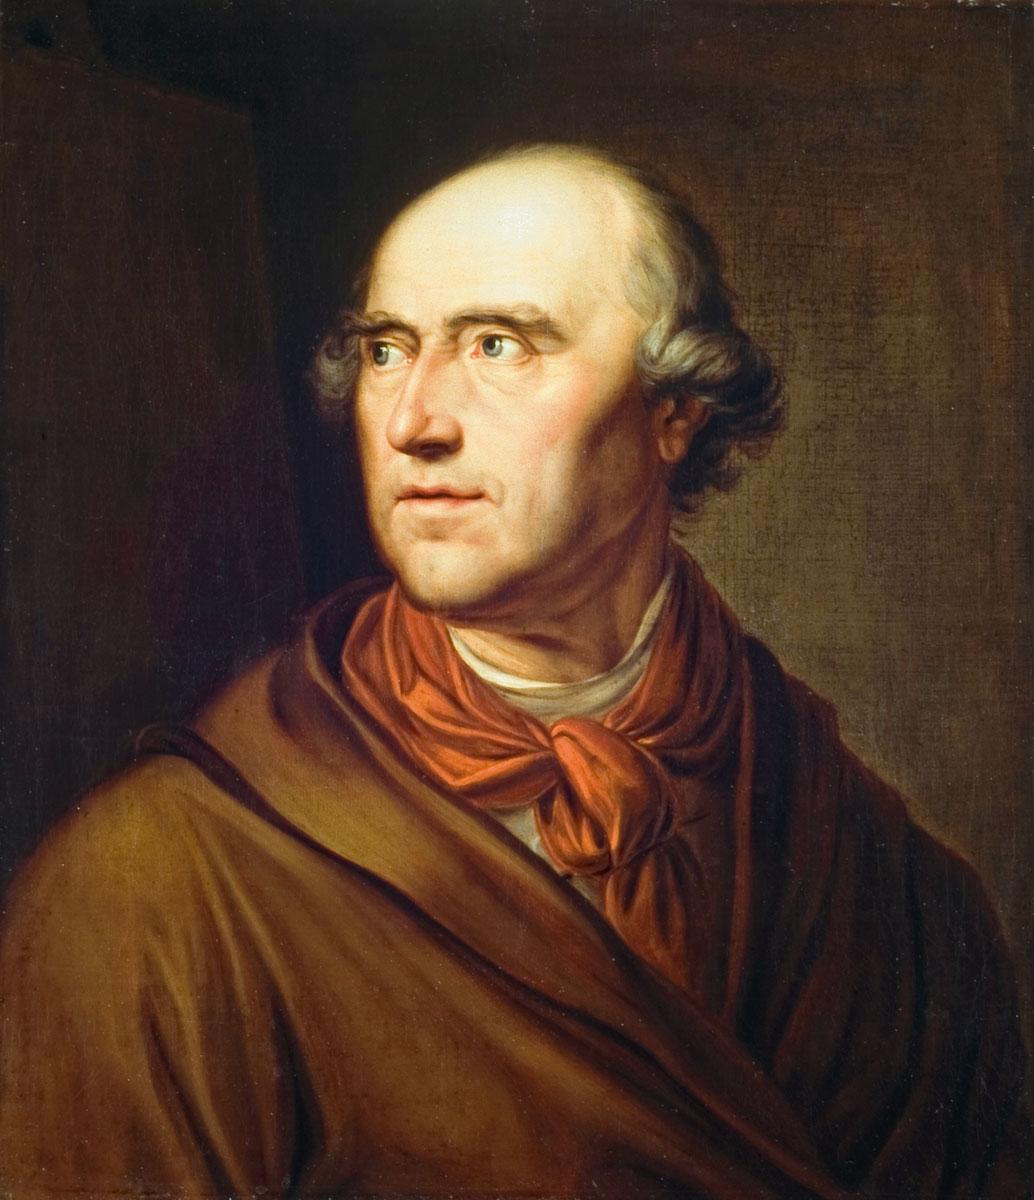 Friedrich Georg Weitsch, Porträt Pascha Johann Friedrich Weitsch, um 1790